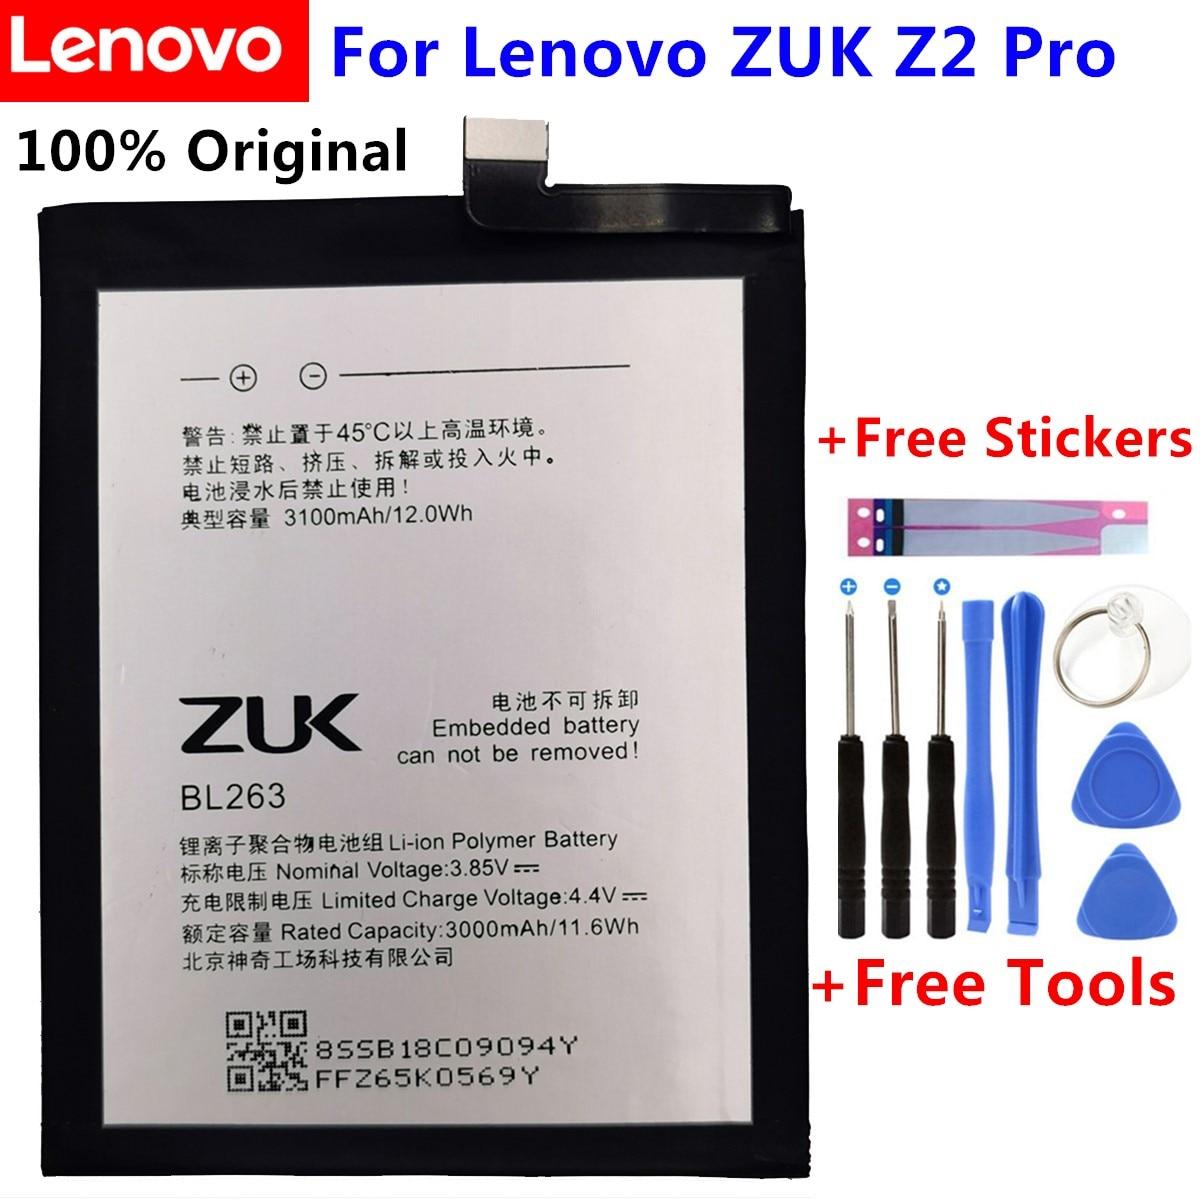 2018 new For Lenovo 3100Mah BL263 Original Battery Replacement for Lenovo ZUK Z2 PRO Z2pro Smart Mobile Phone